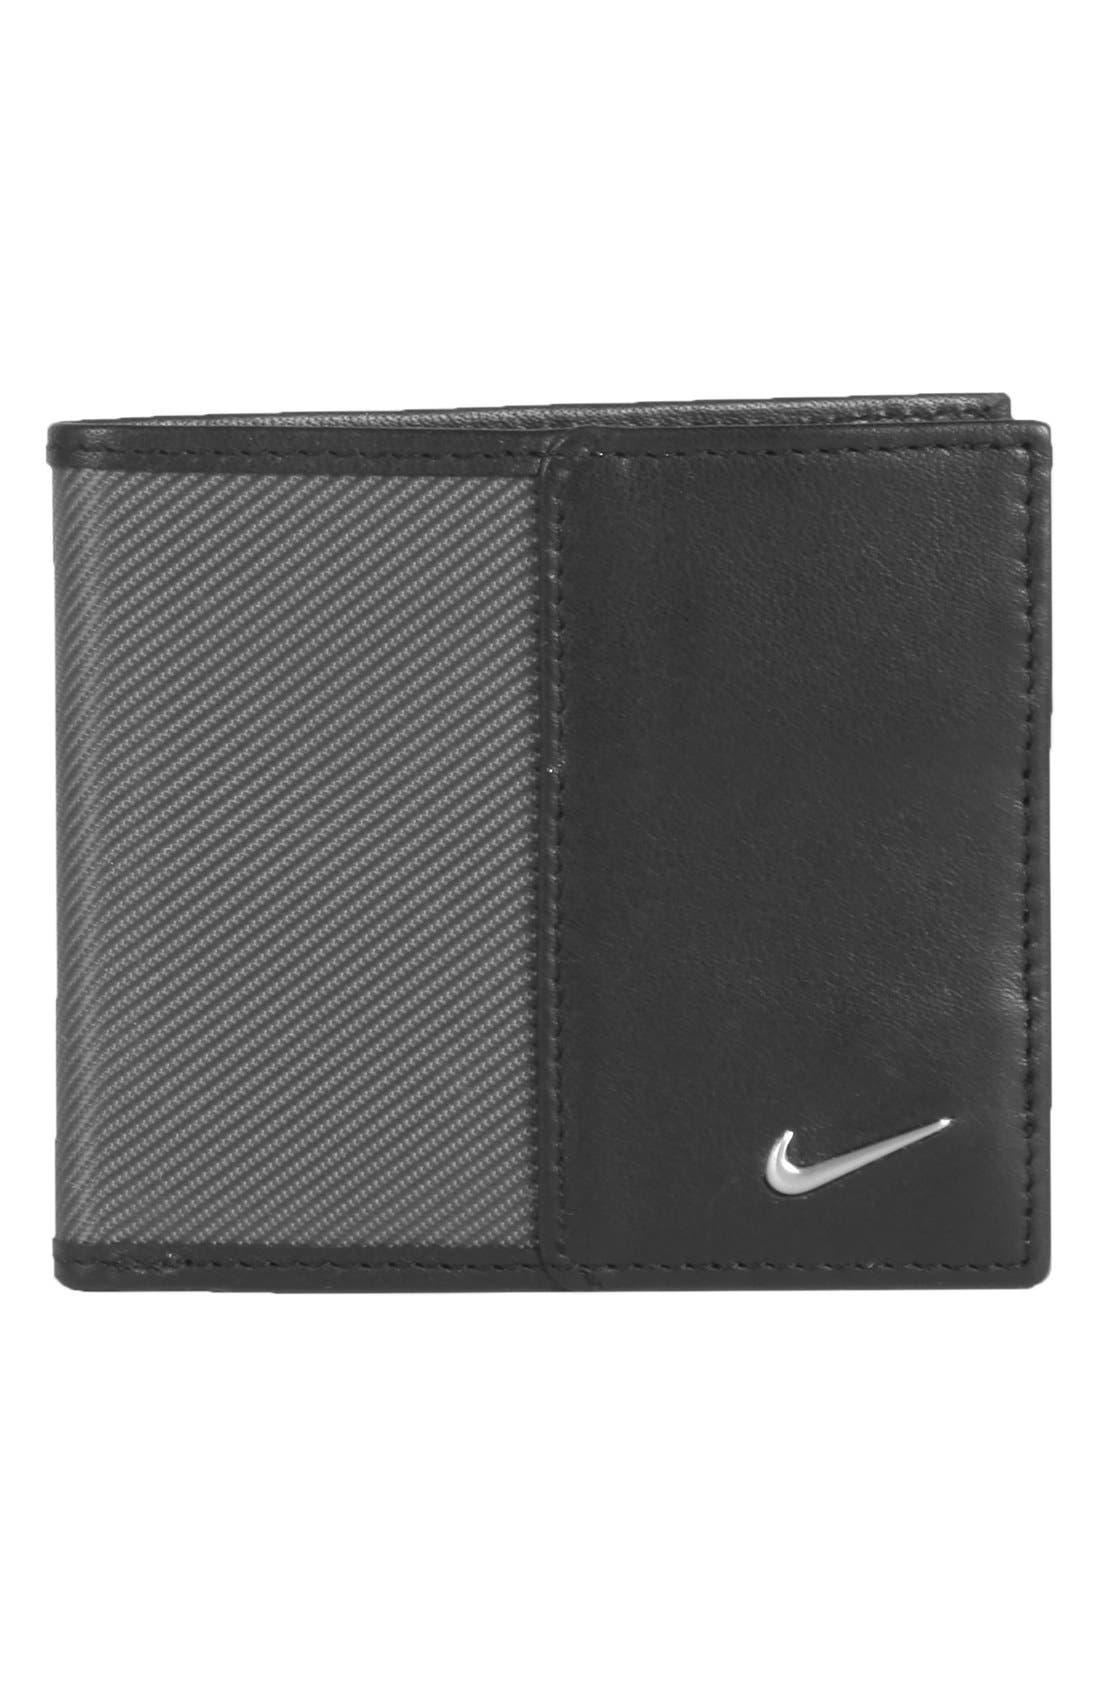 Tech Twill Wallet,                         Main,                         color, 021